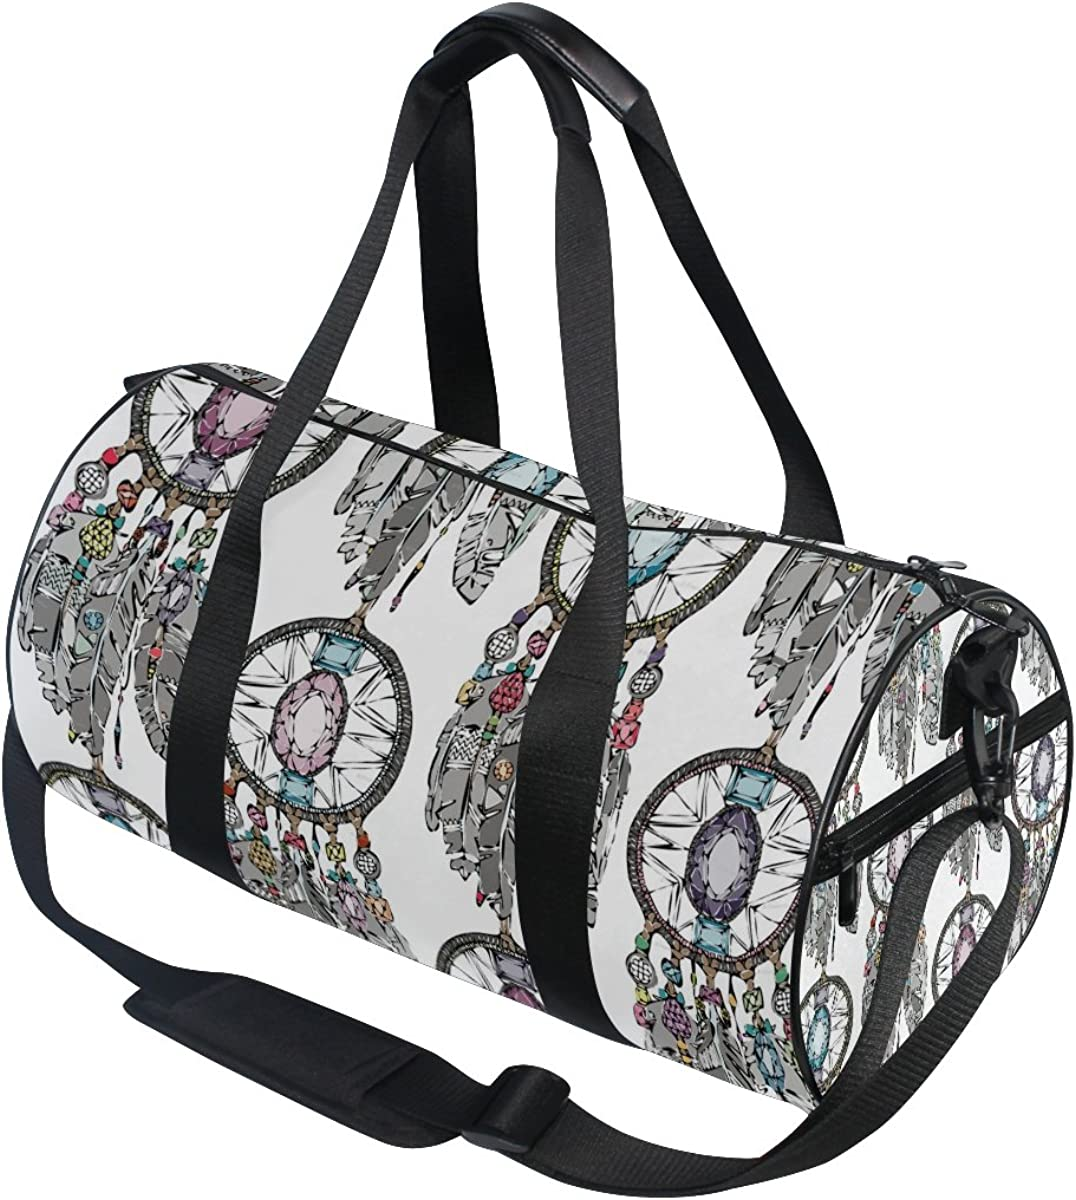 Evolutions Dream Catcher Feather Duffels Bag Sports Gym Bags for Men /& Women